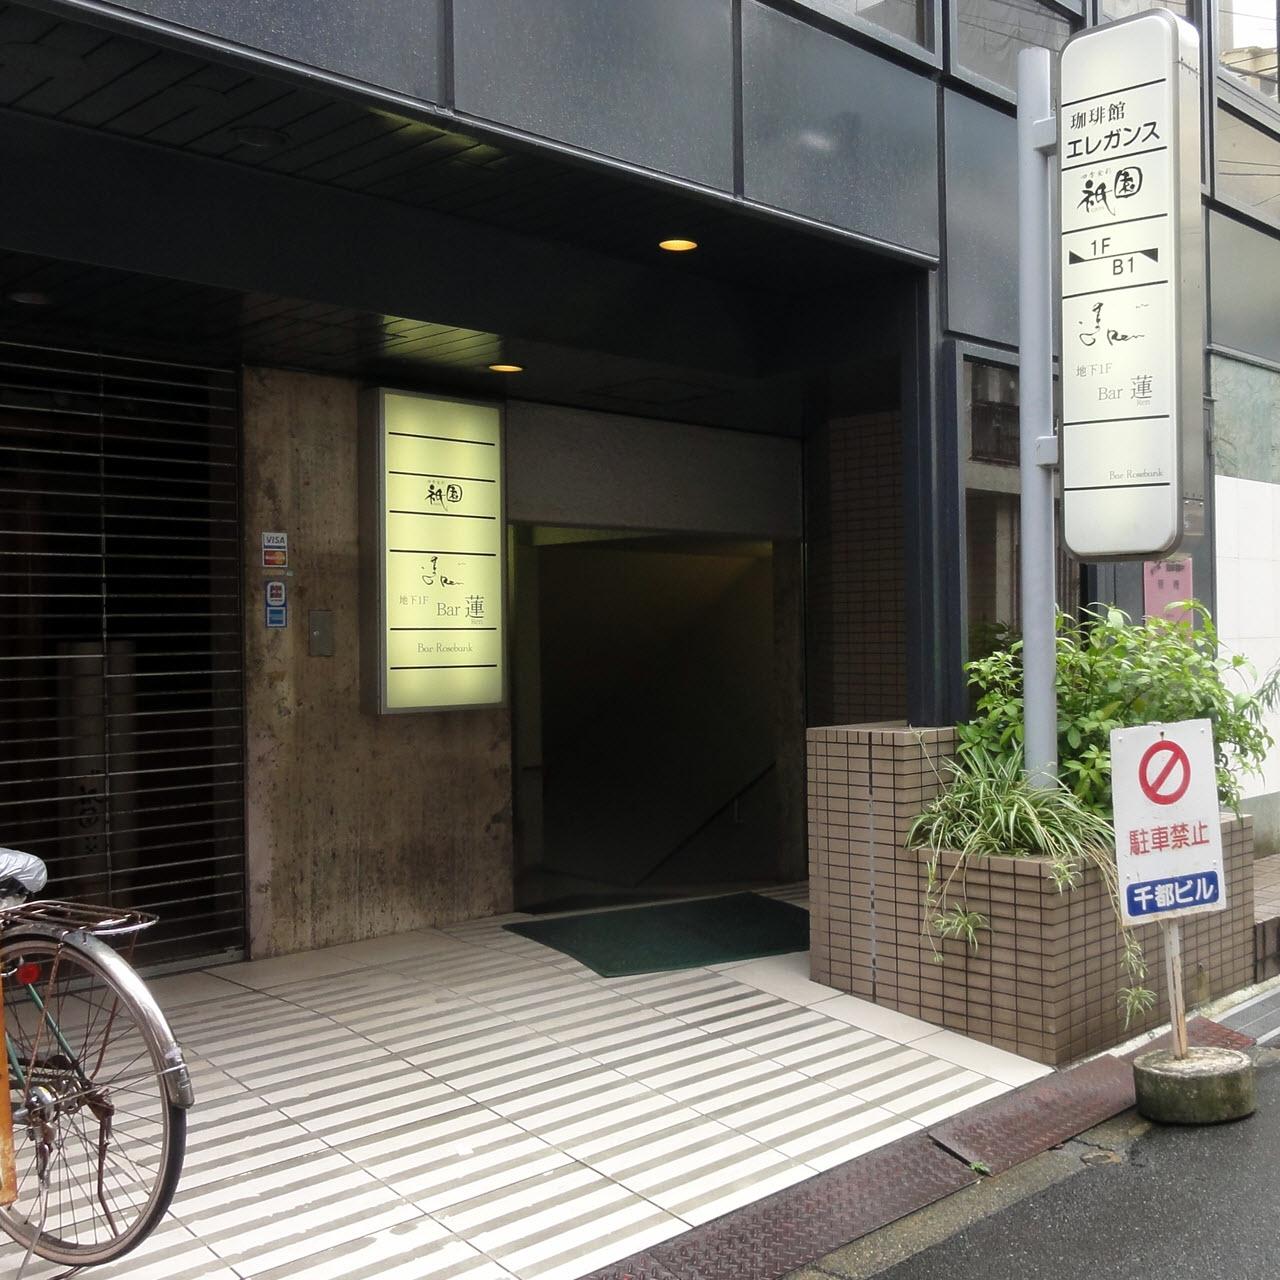 Japan - Survival guide for the whisky drinker - address